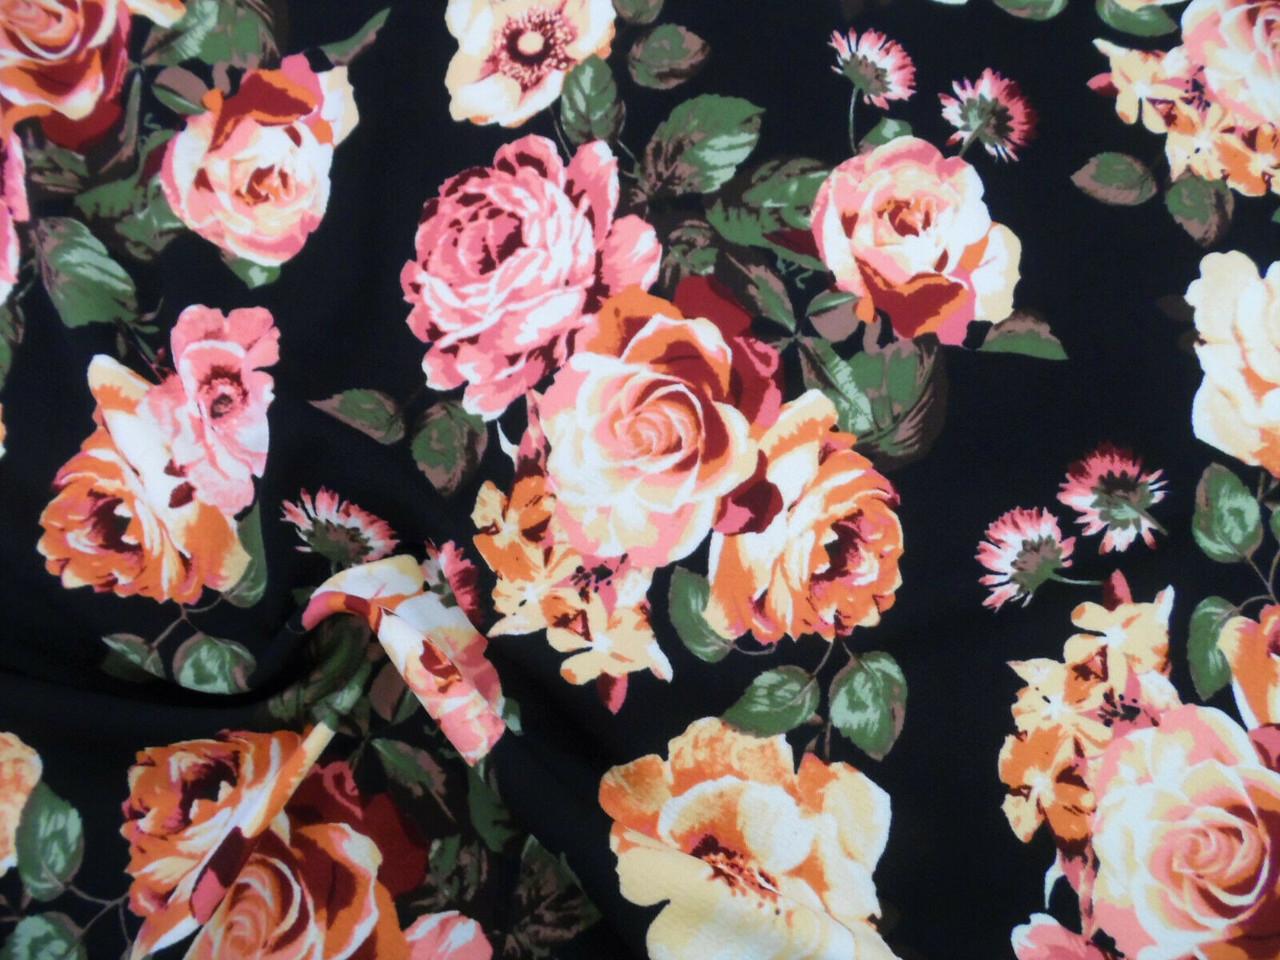 Printed Liverpool Textured 4 way Stretch Fabric Black Mauve Peach Floral I105